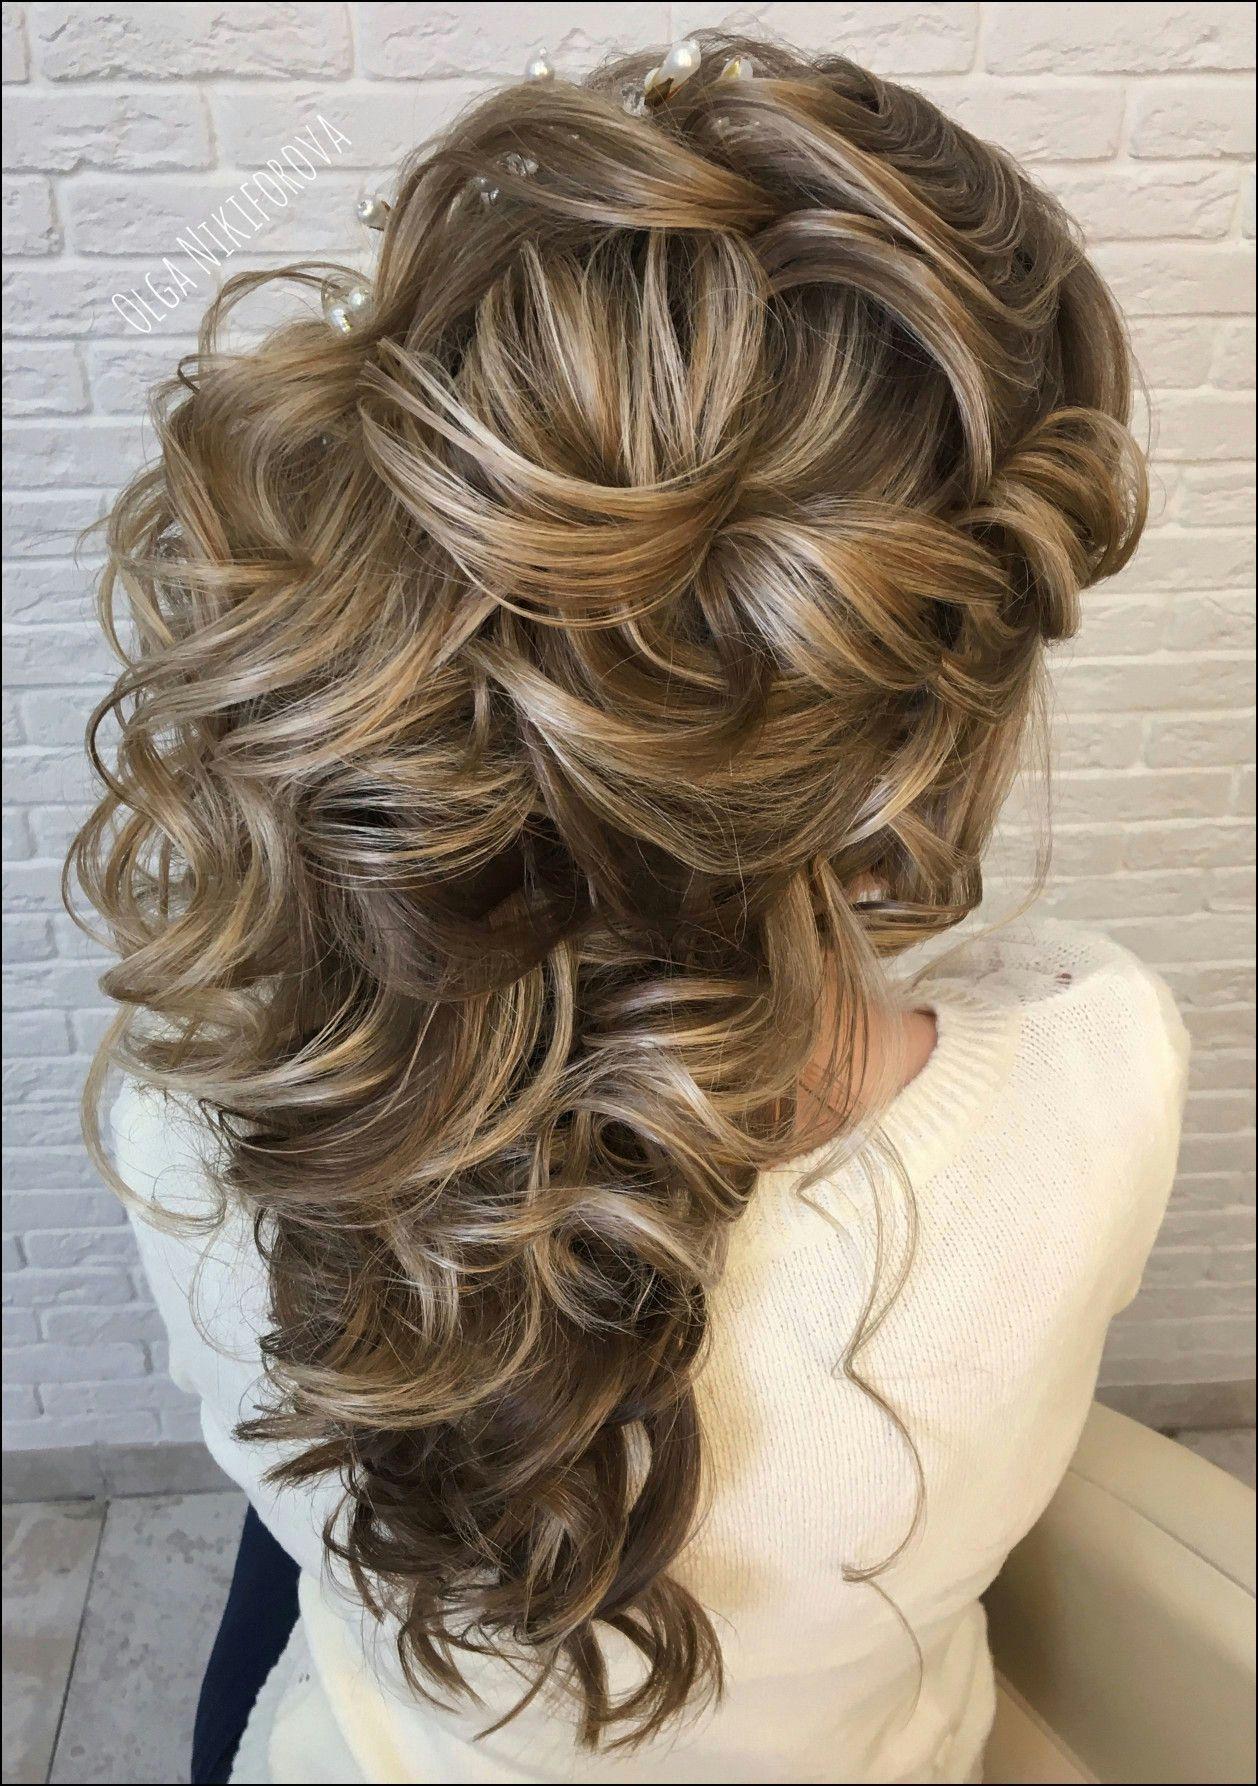 Haar Frisuren Offen Haar Frisuren Offen Haar Frisuren Offen 80 Haar Frisuren Mittellang Haarfrisuren Frisur Hair Styles Long Hair Styles Hair Beauty